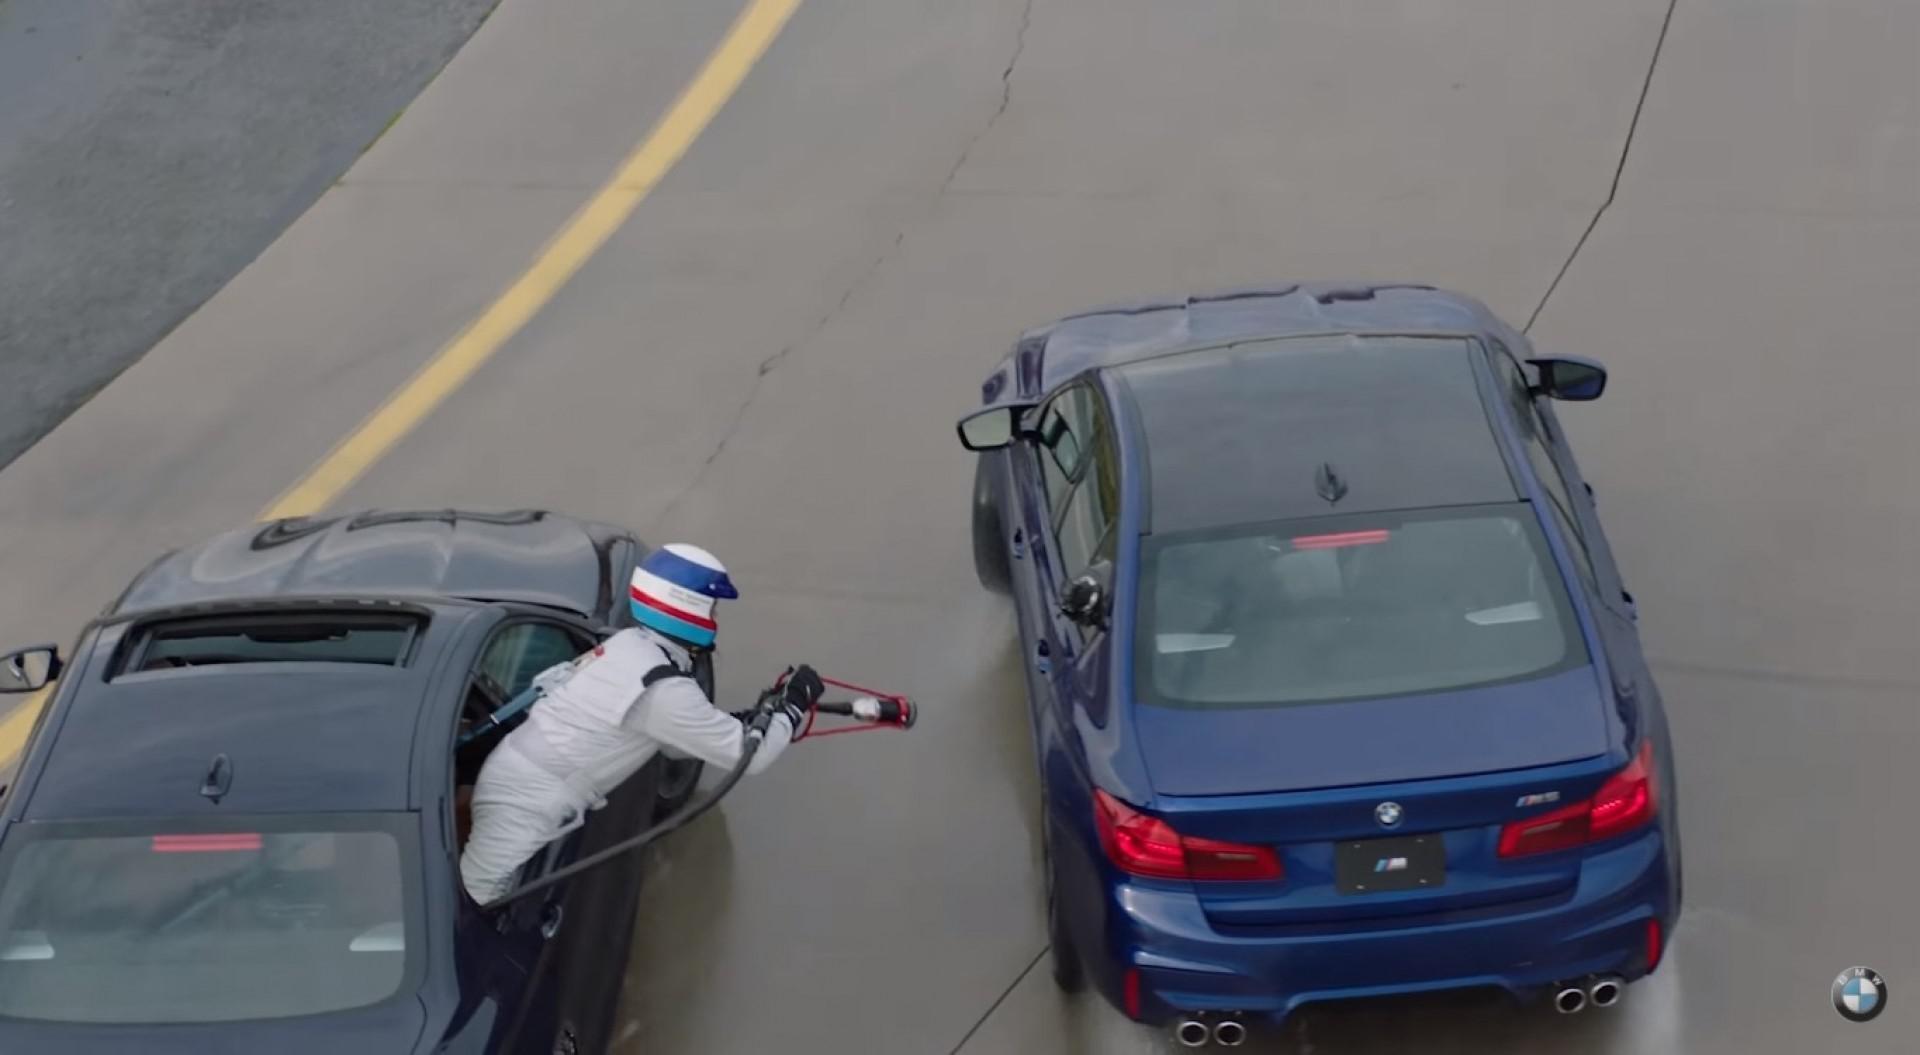 Record du monde battu ! BMW M5 drift pendant 8h